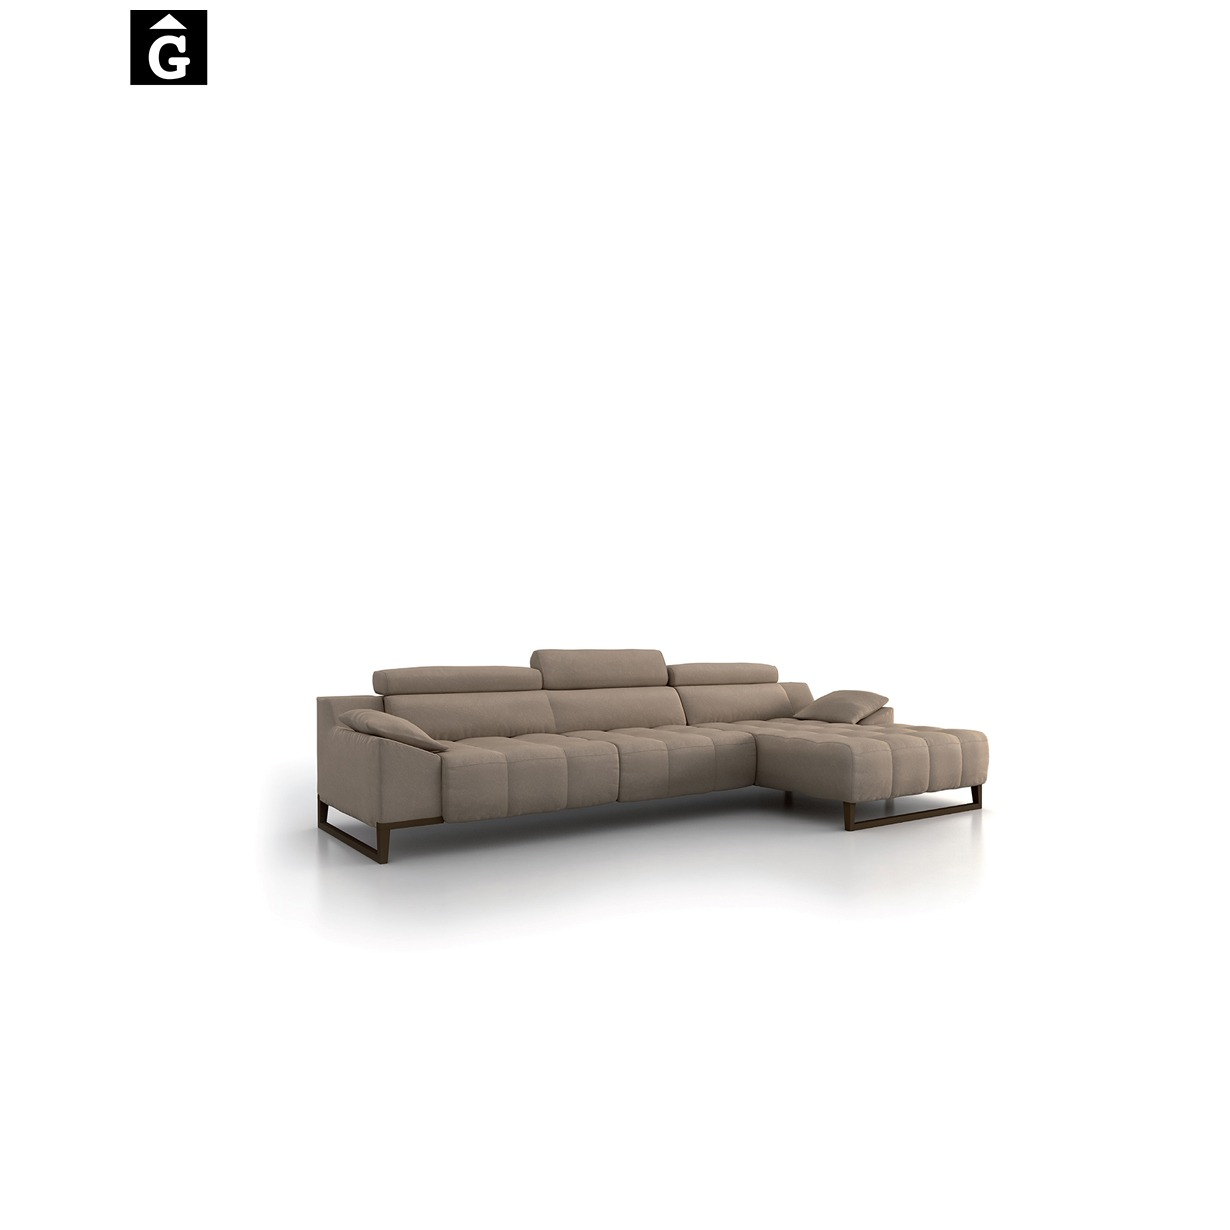 Composicions sofàs